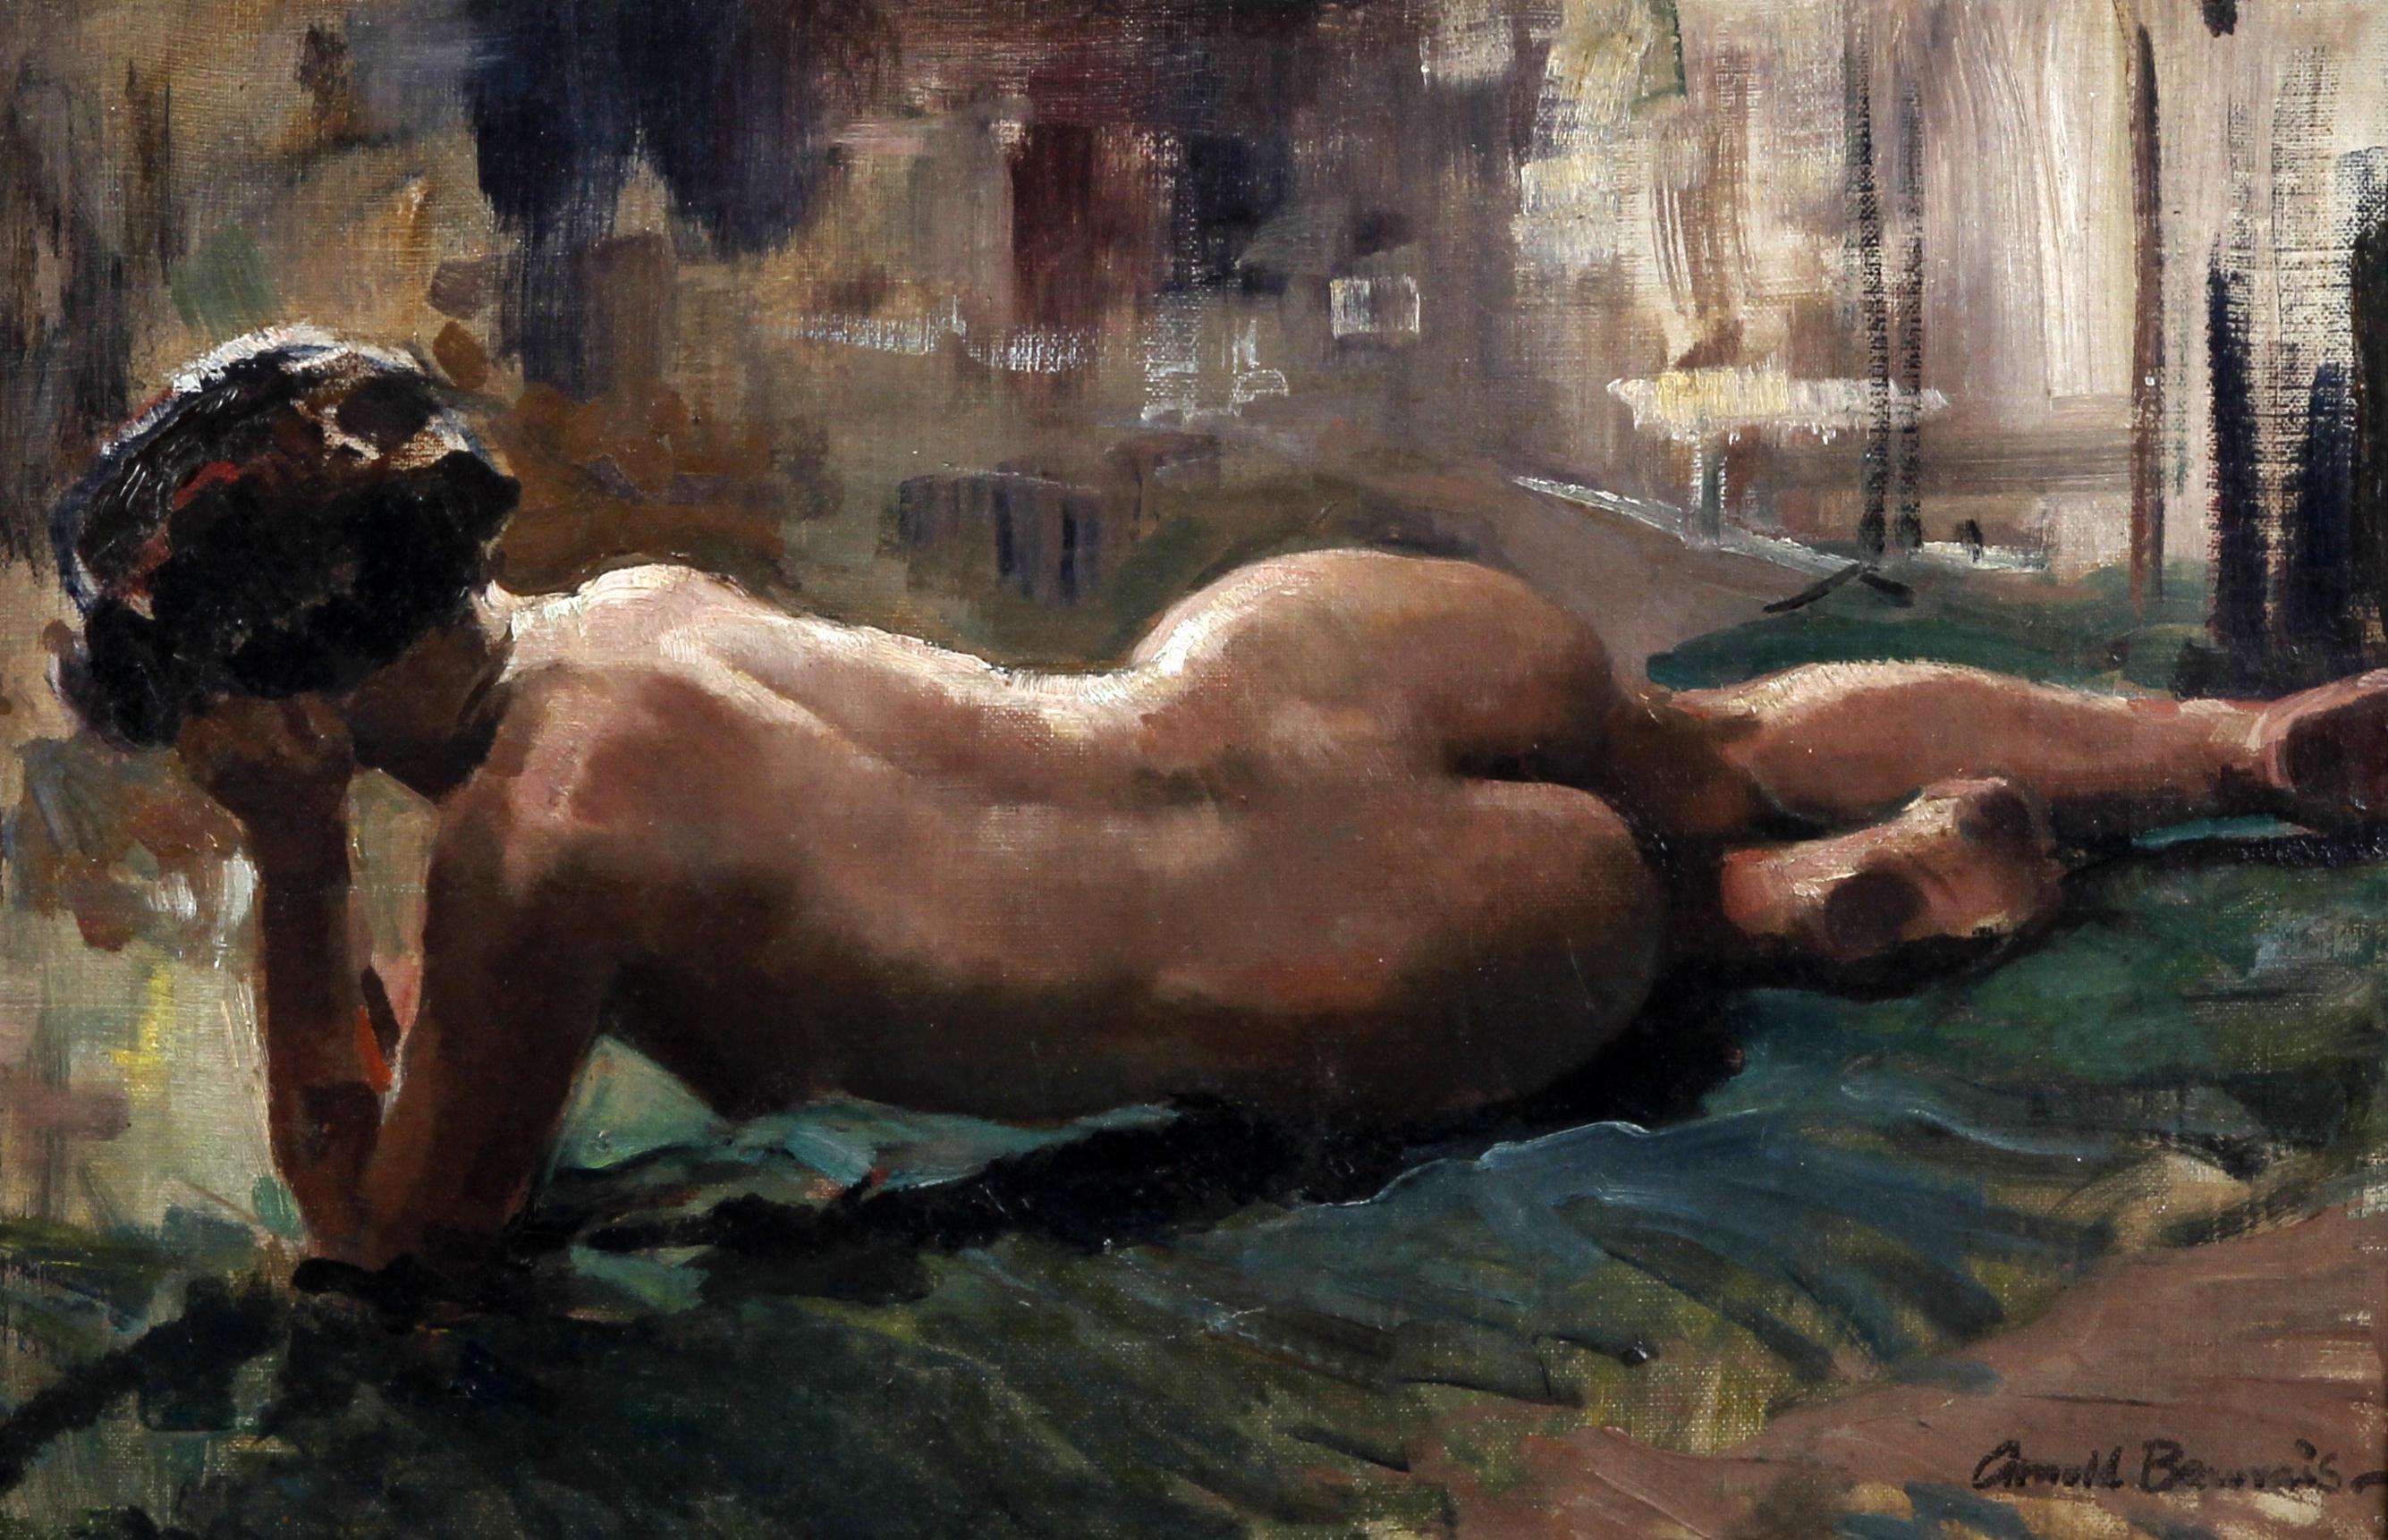 Arnold Beauvais, род в 1886. Лежащая обнаженная. 30 х 36 см. Частная коллекция